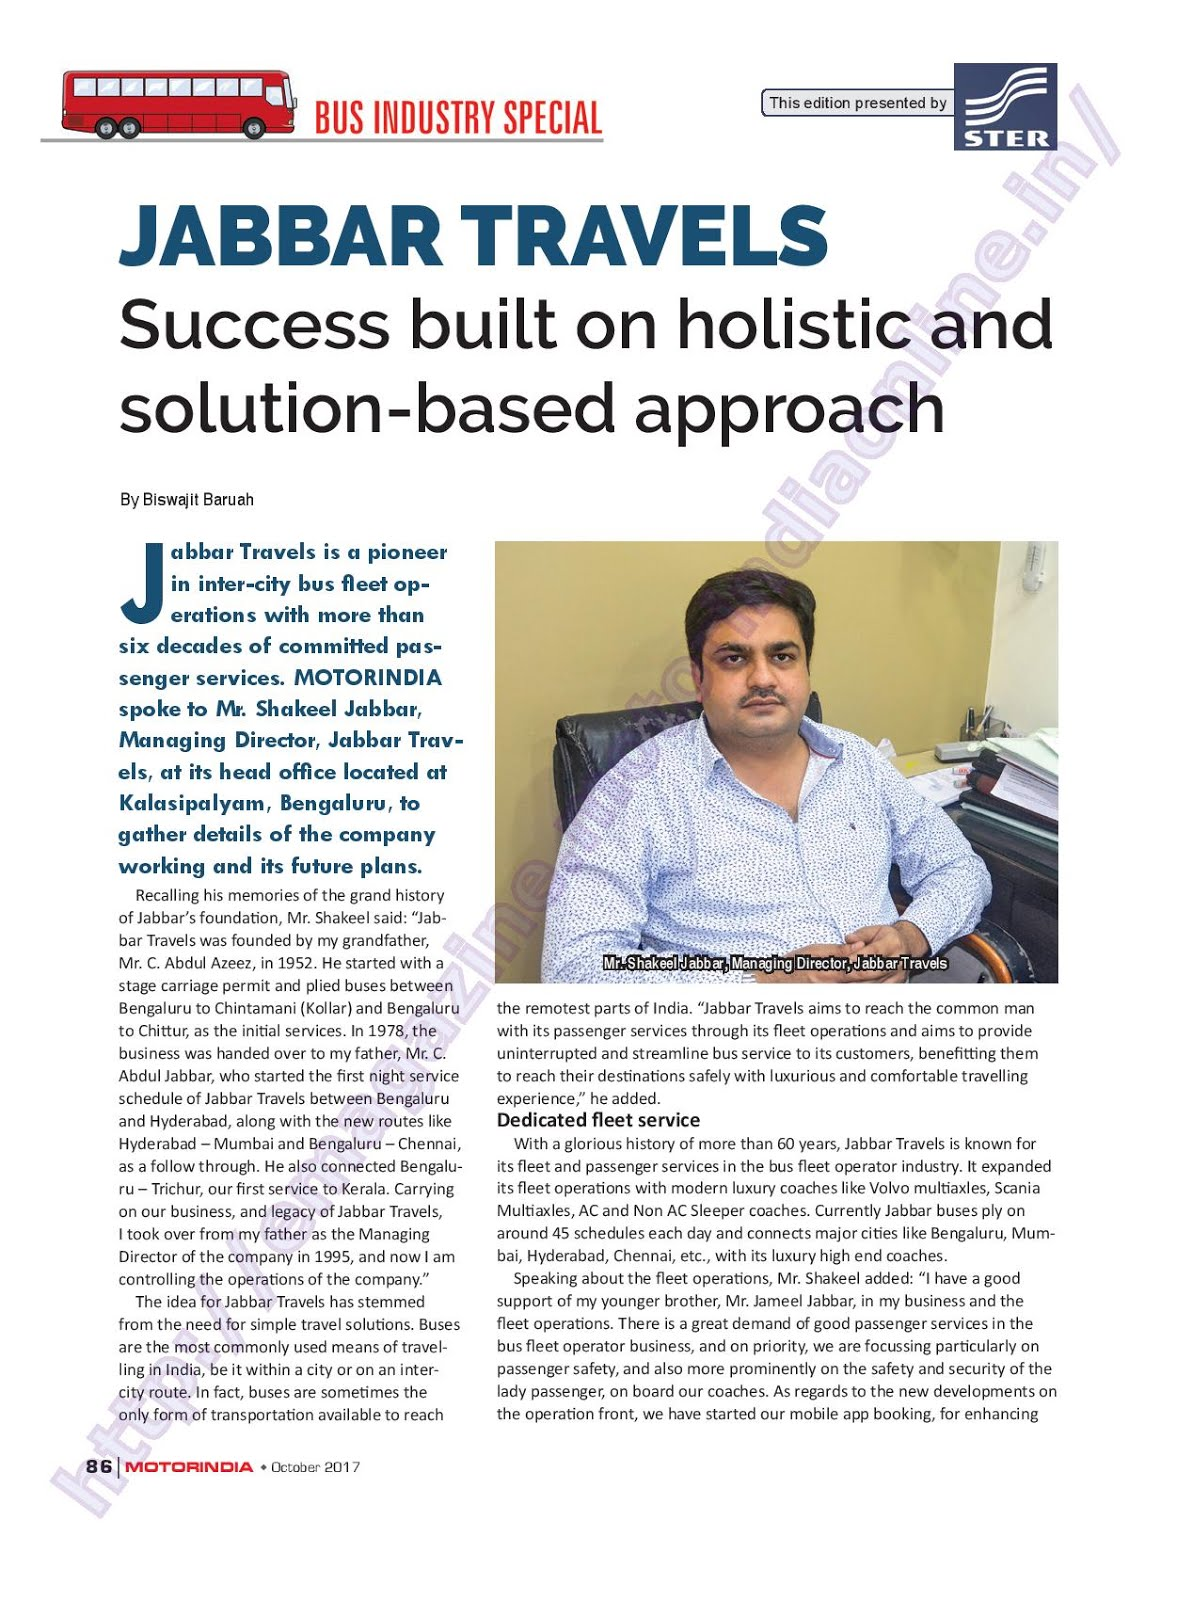 MOTOR INDIA ARTICLE 21 : JABBAR TRAVELS